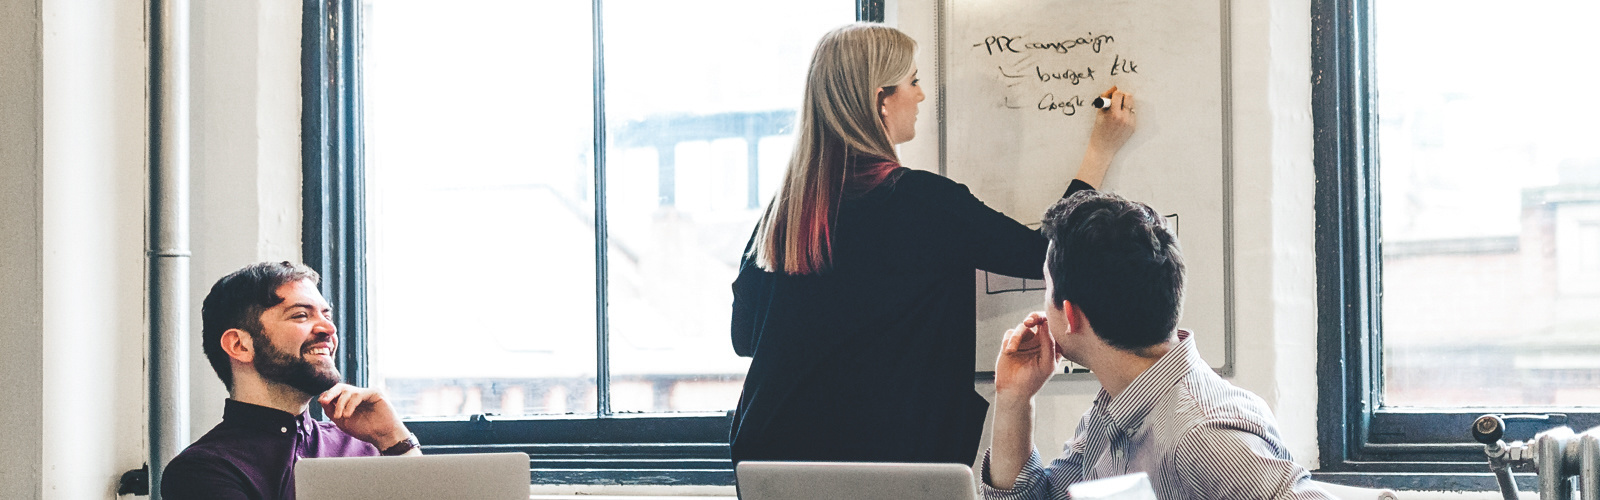 impression agency strategic marketing